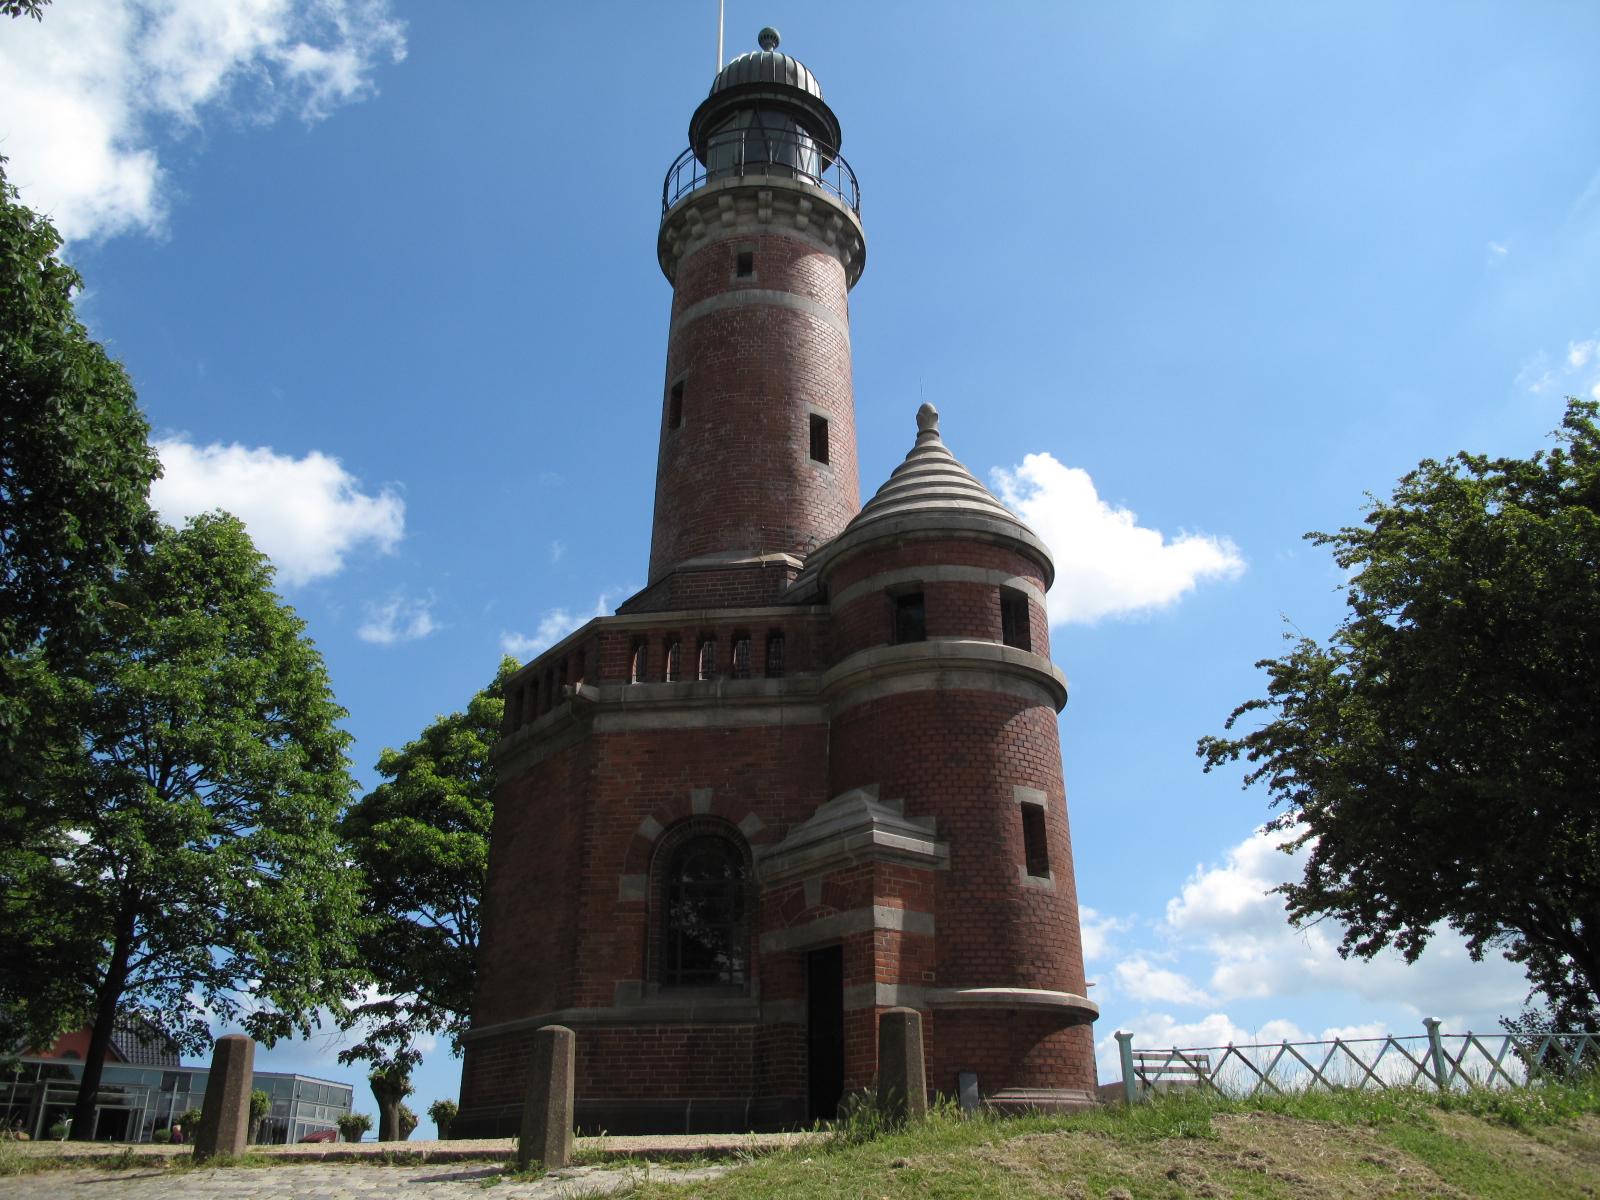 Leuchturm Holtenau